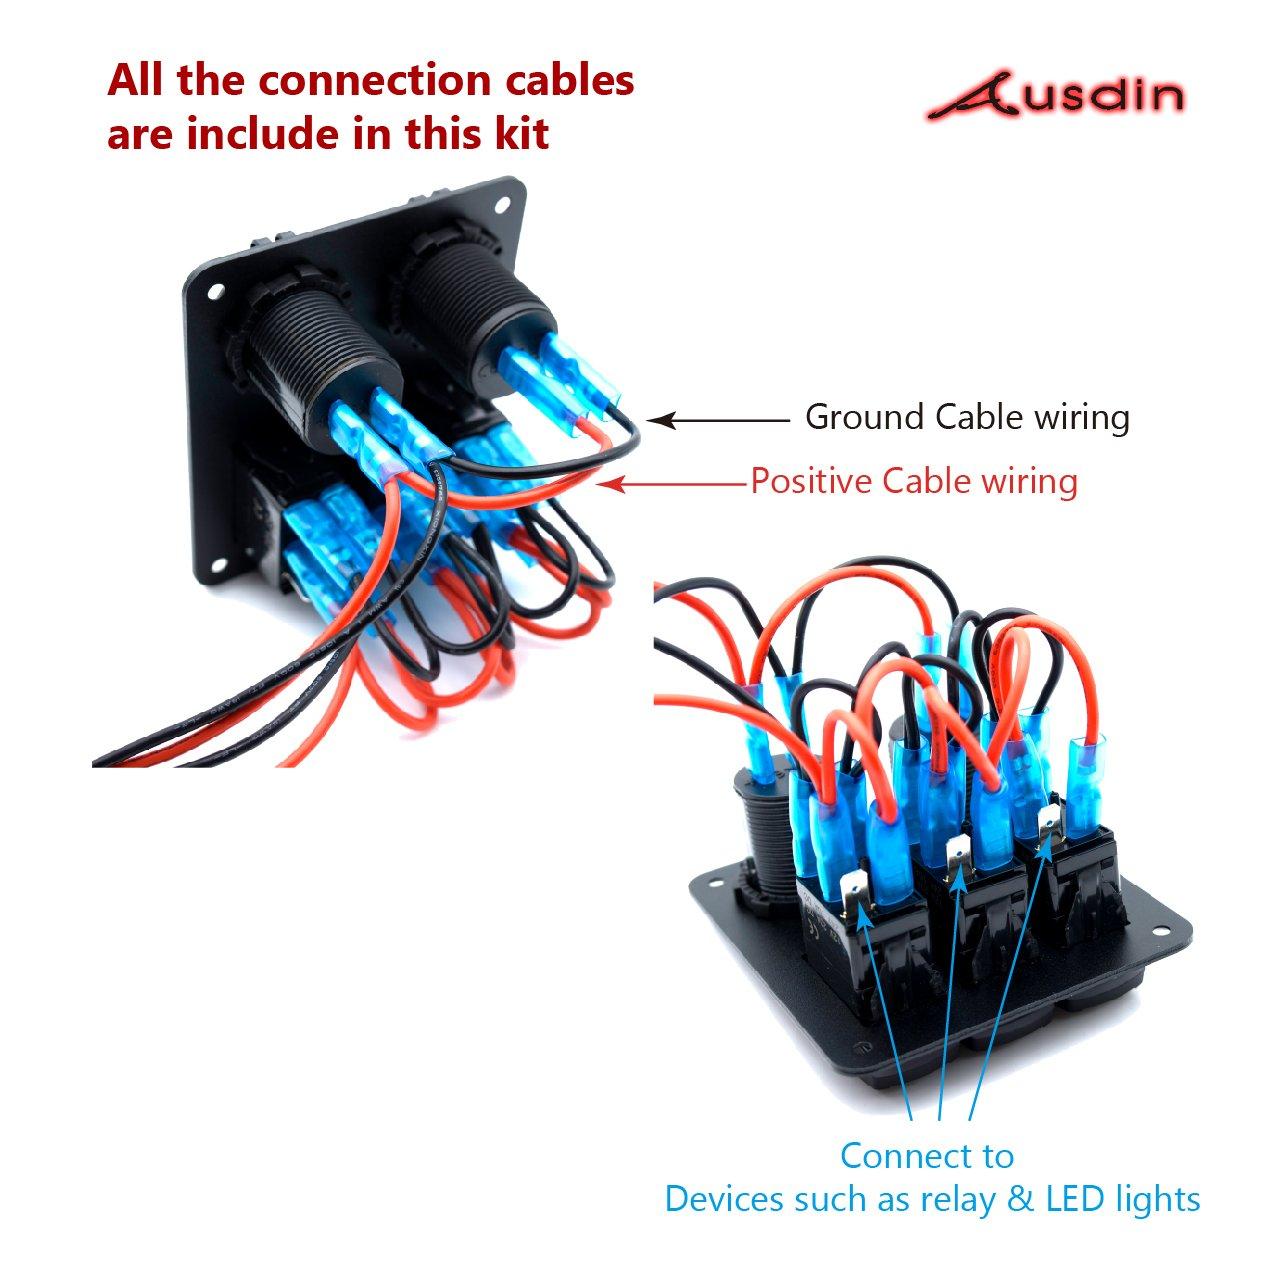 amazon com switch panel ausdin 3 gang laser rocker switch panel led rh amazon com